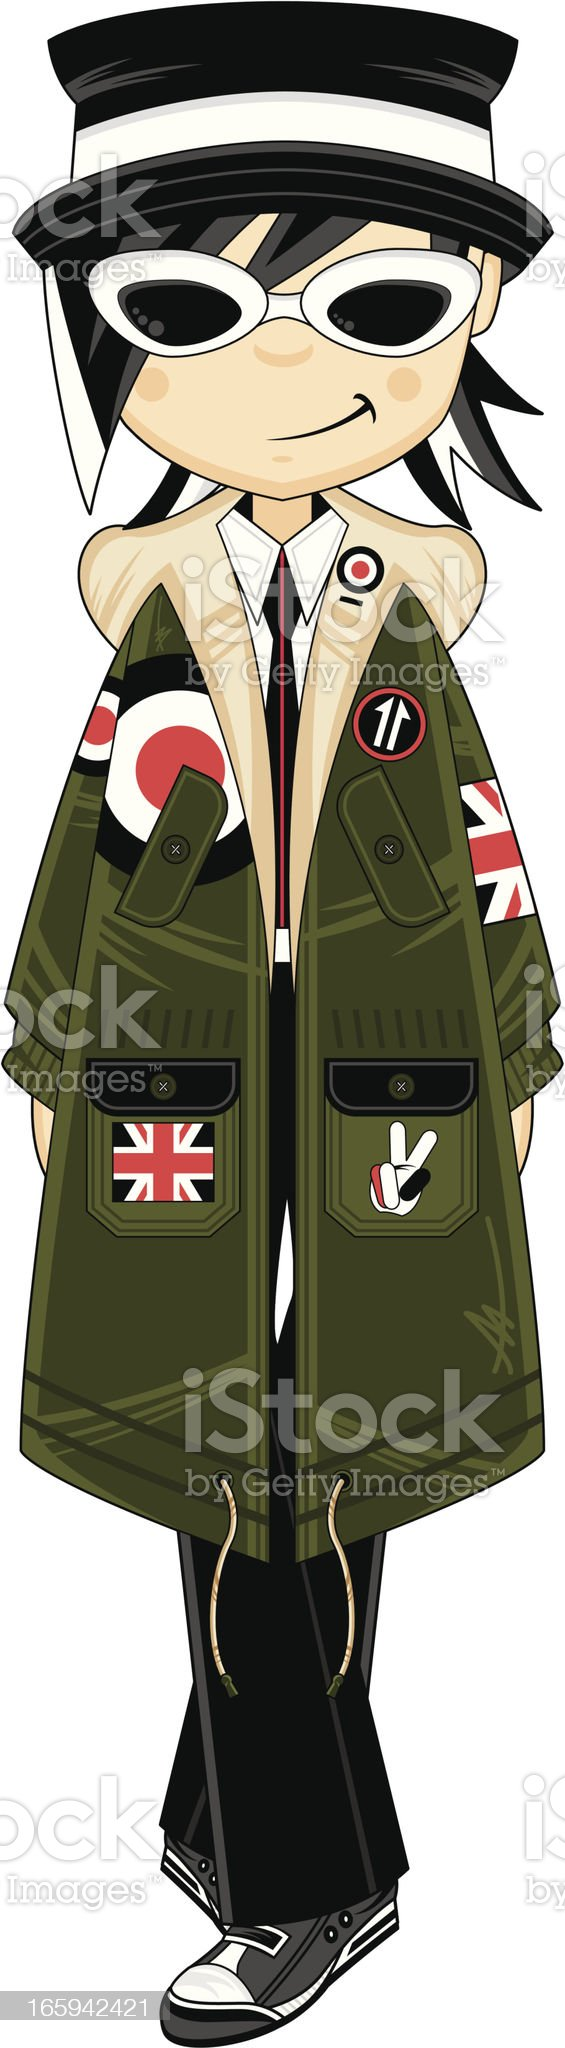 Cool Mod Girl wearing Parka Jacket royalty-free stock vector art